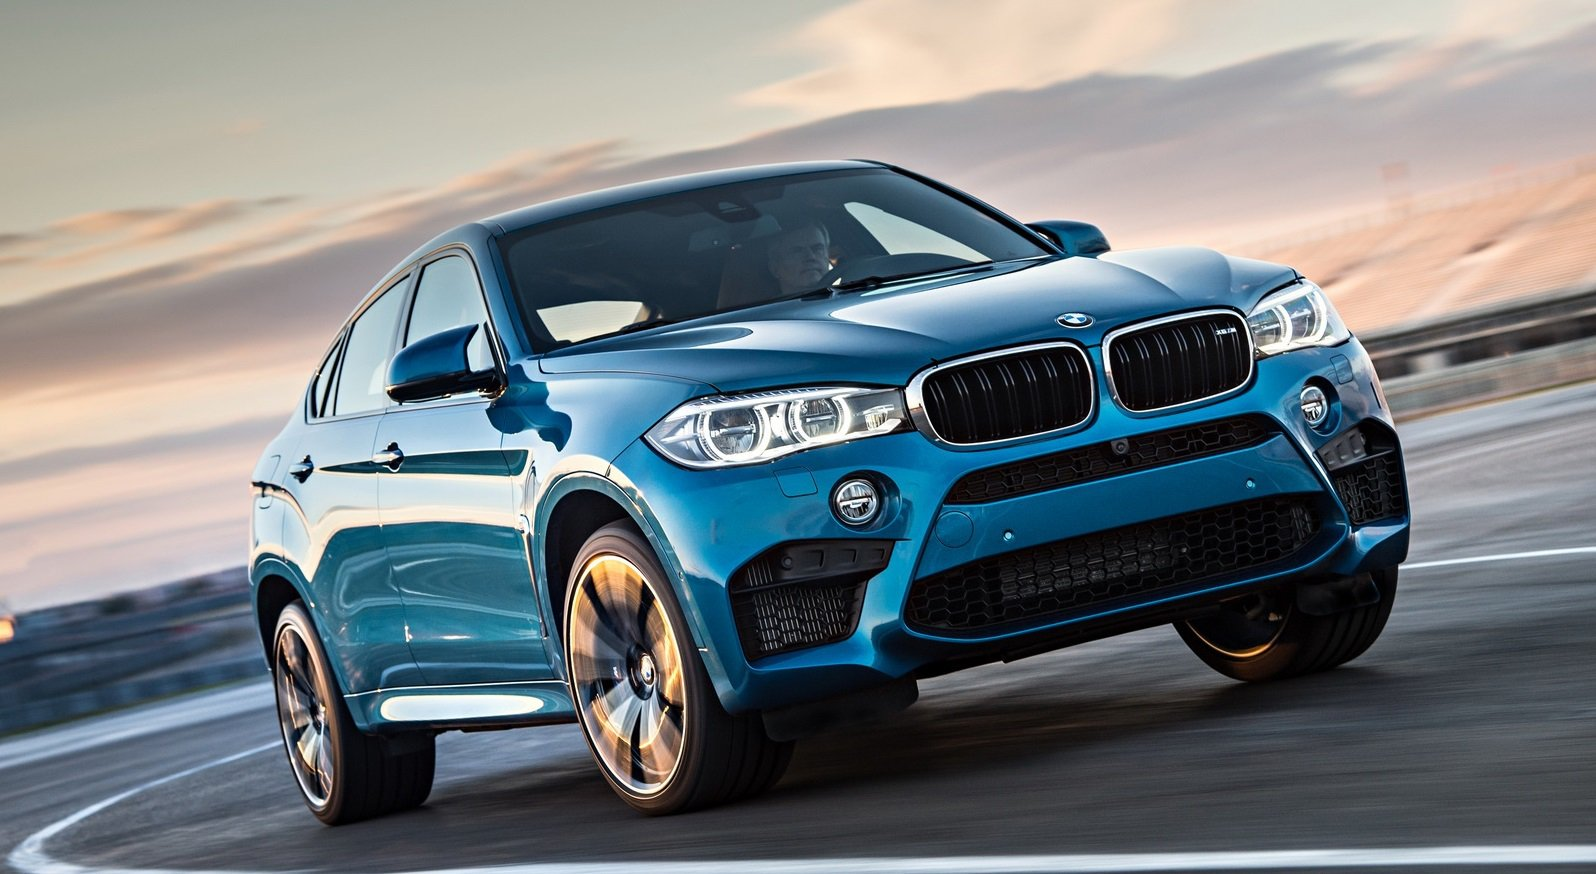 2015 BMW X6 M, огромная подборка фотографий [148 фото]